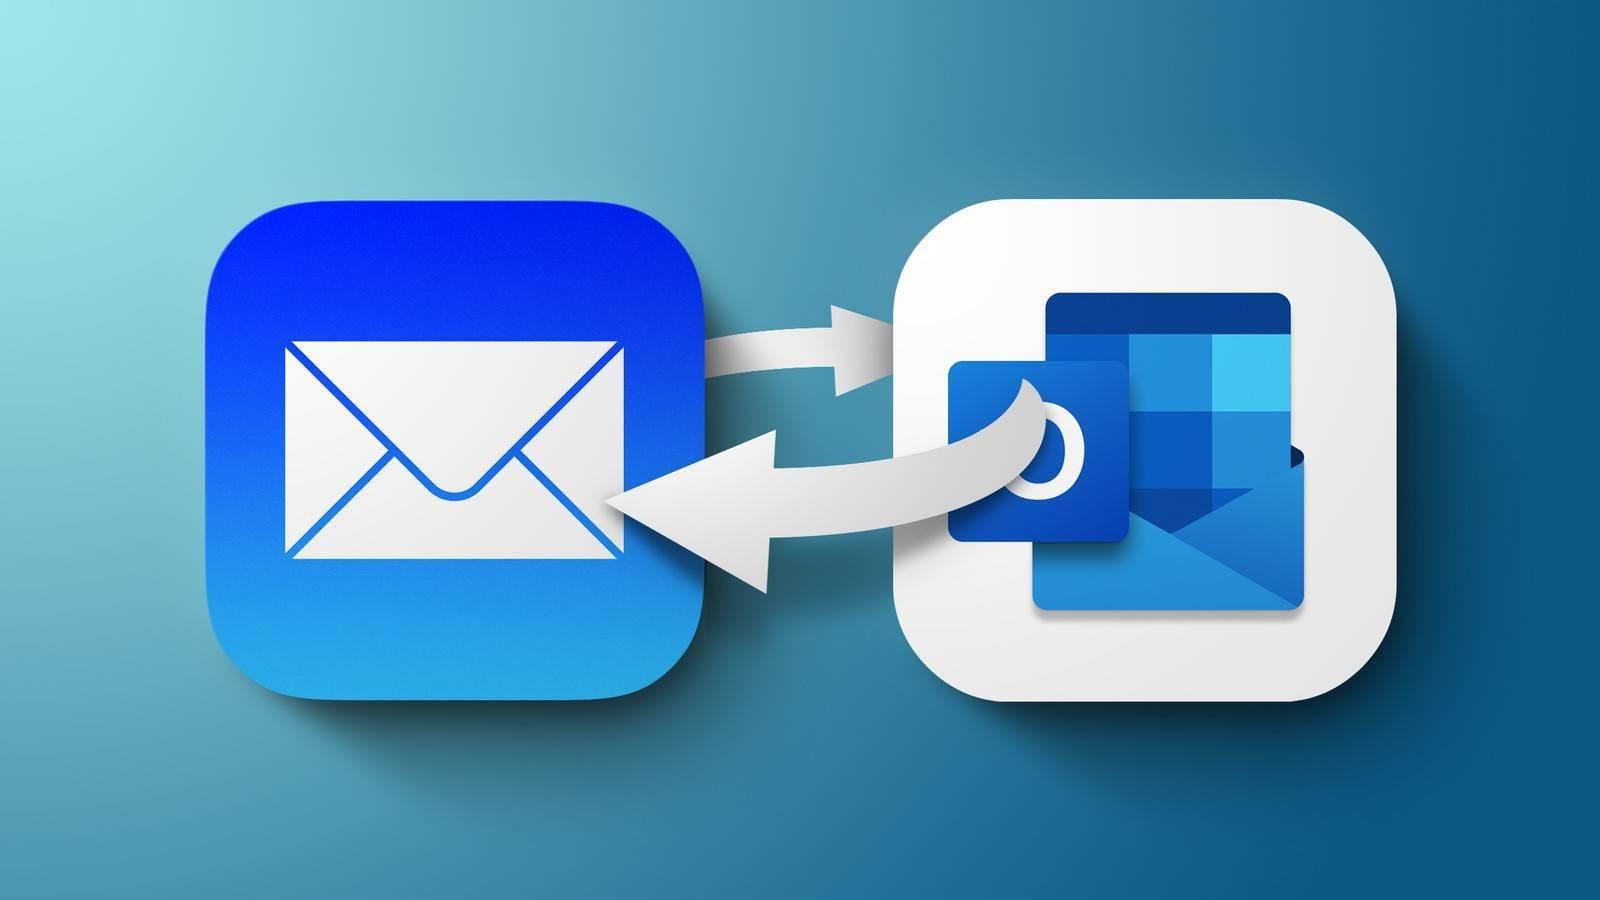 iOS/iPadOS 14出Bug了:重启设备会还原邮件和浏览器的默认应用设置